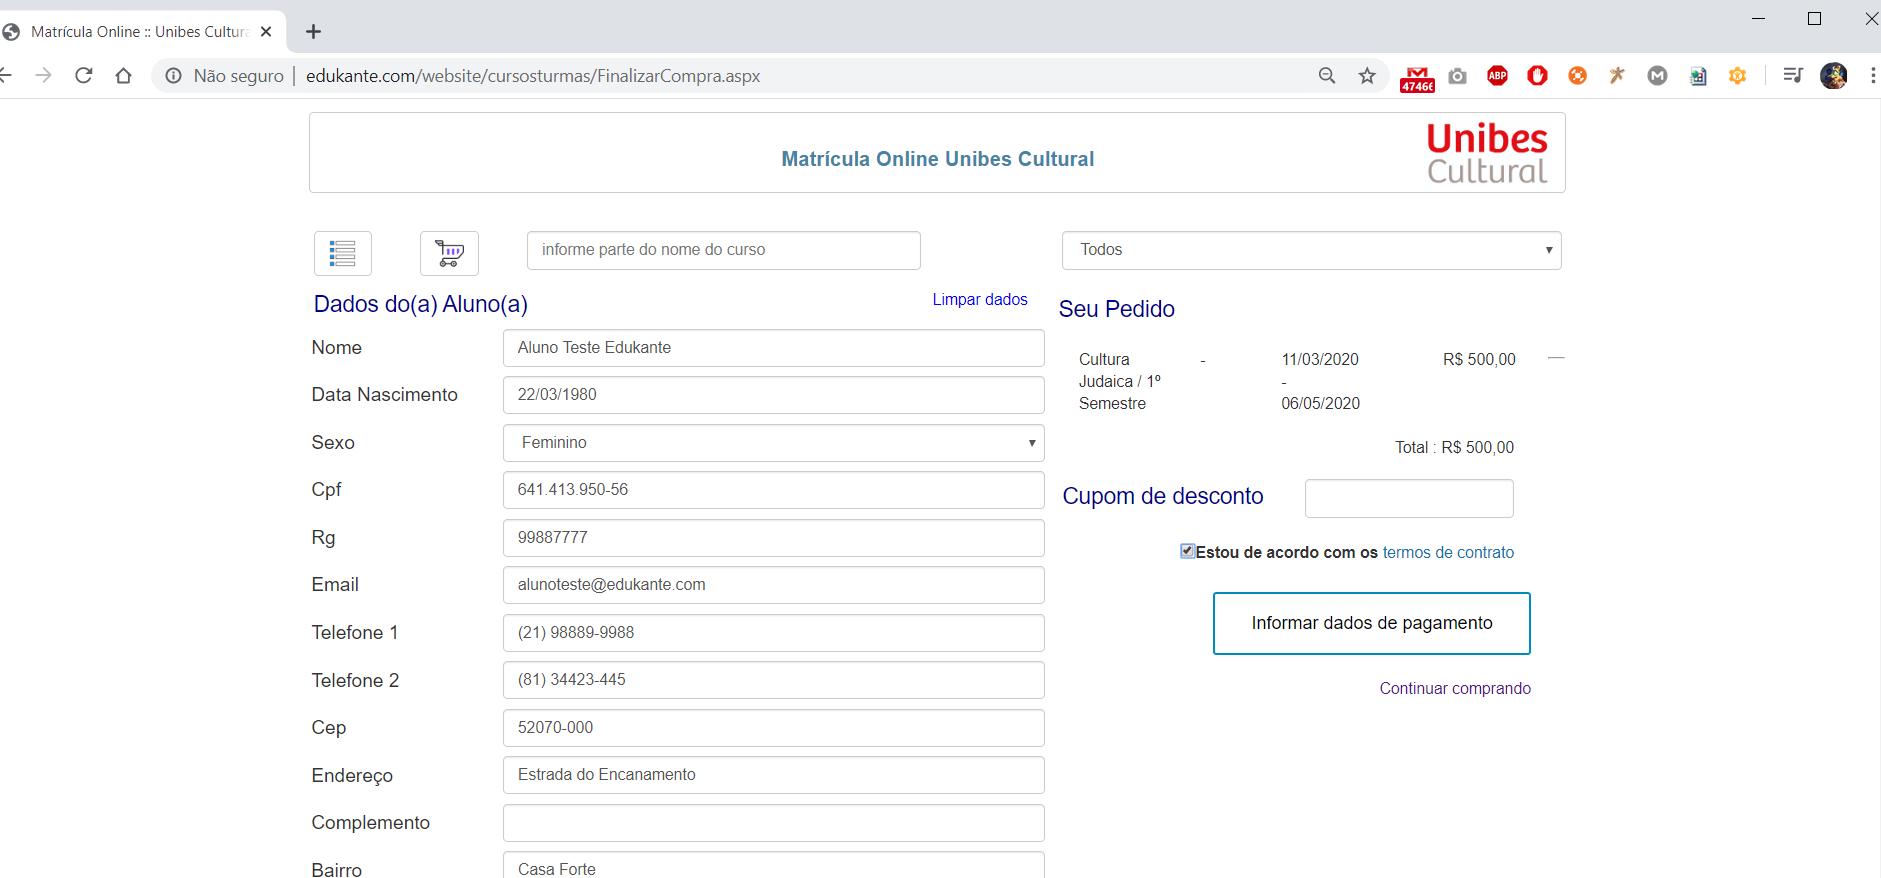 Software Controle de Matrículas Online